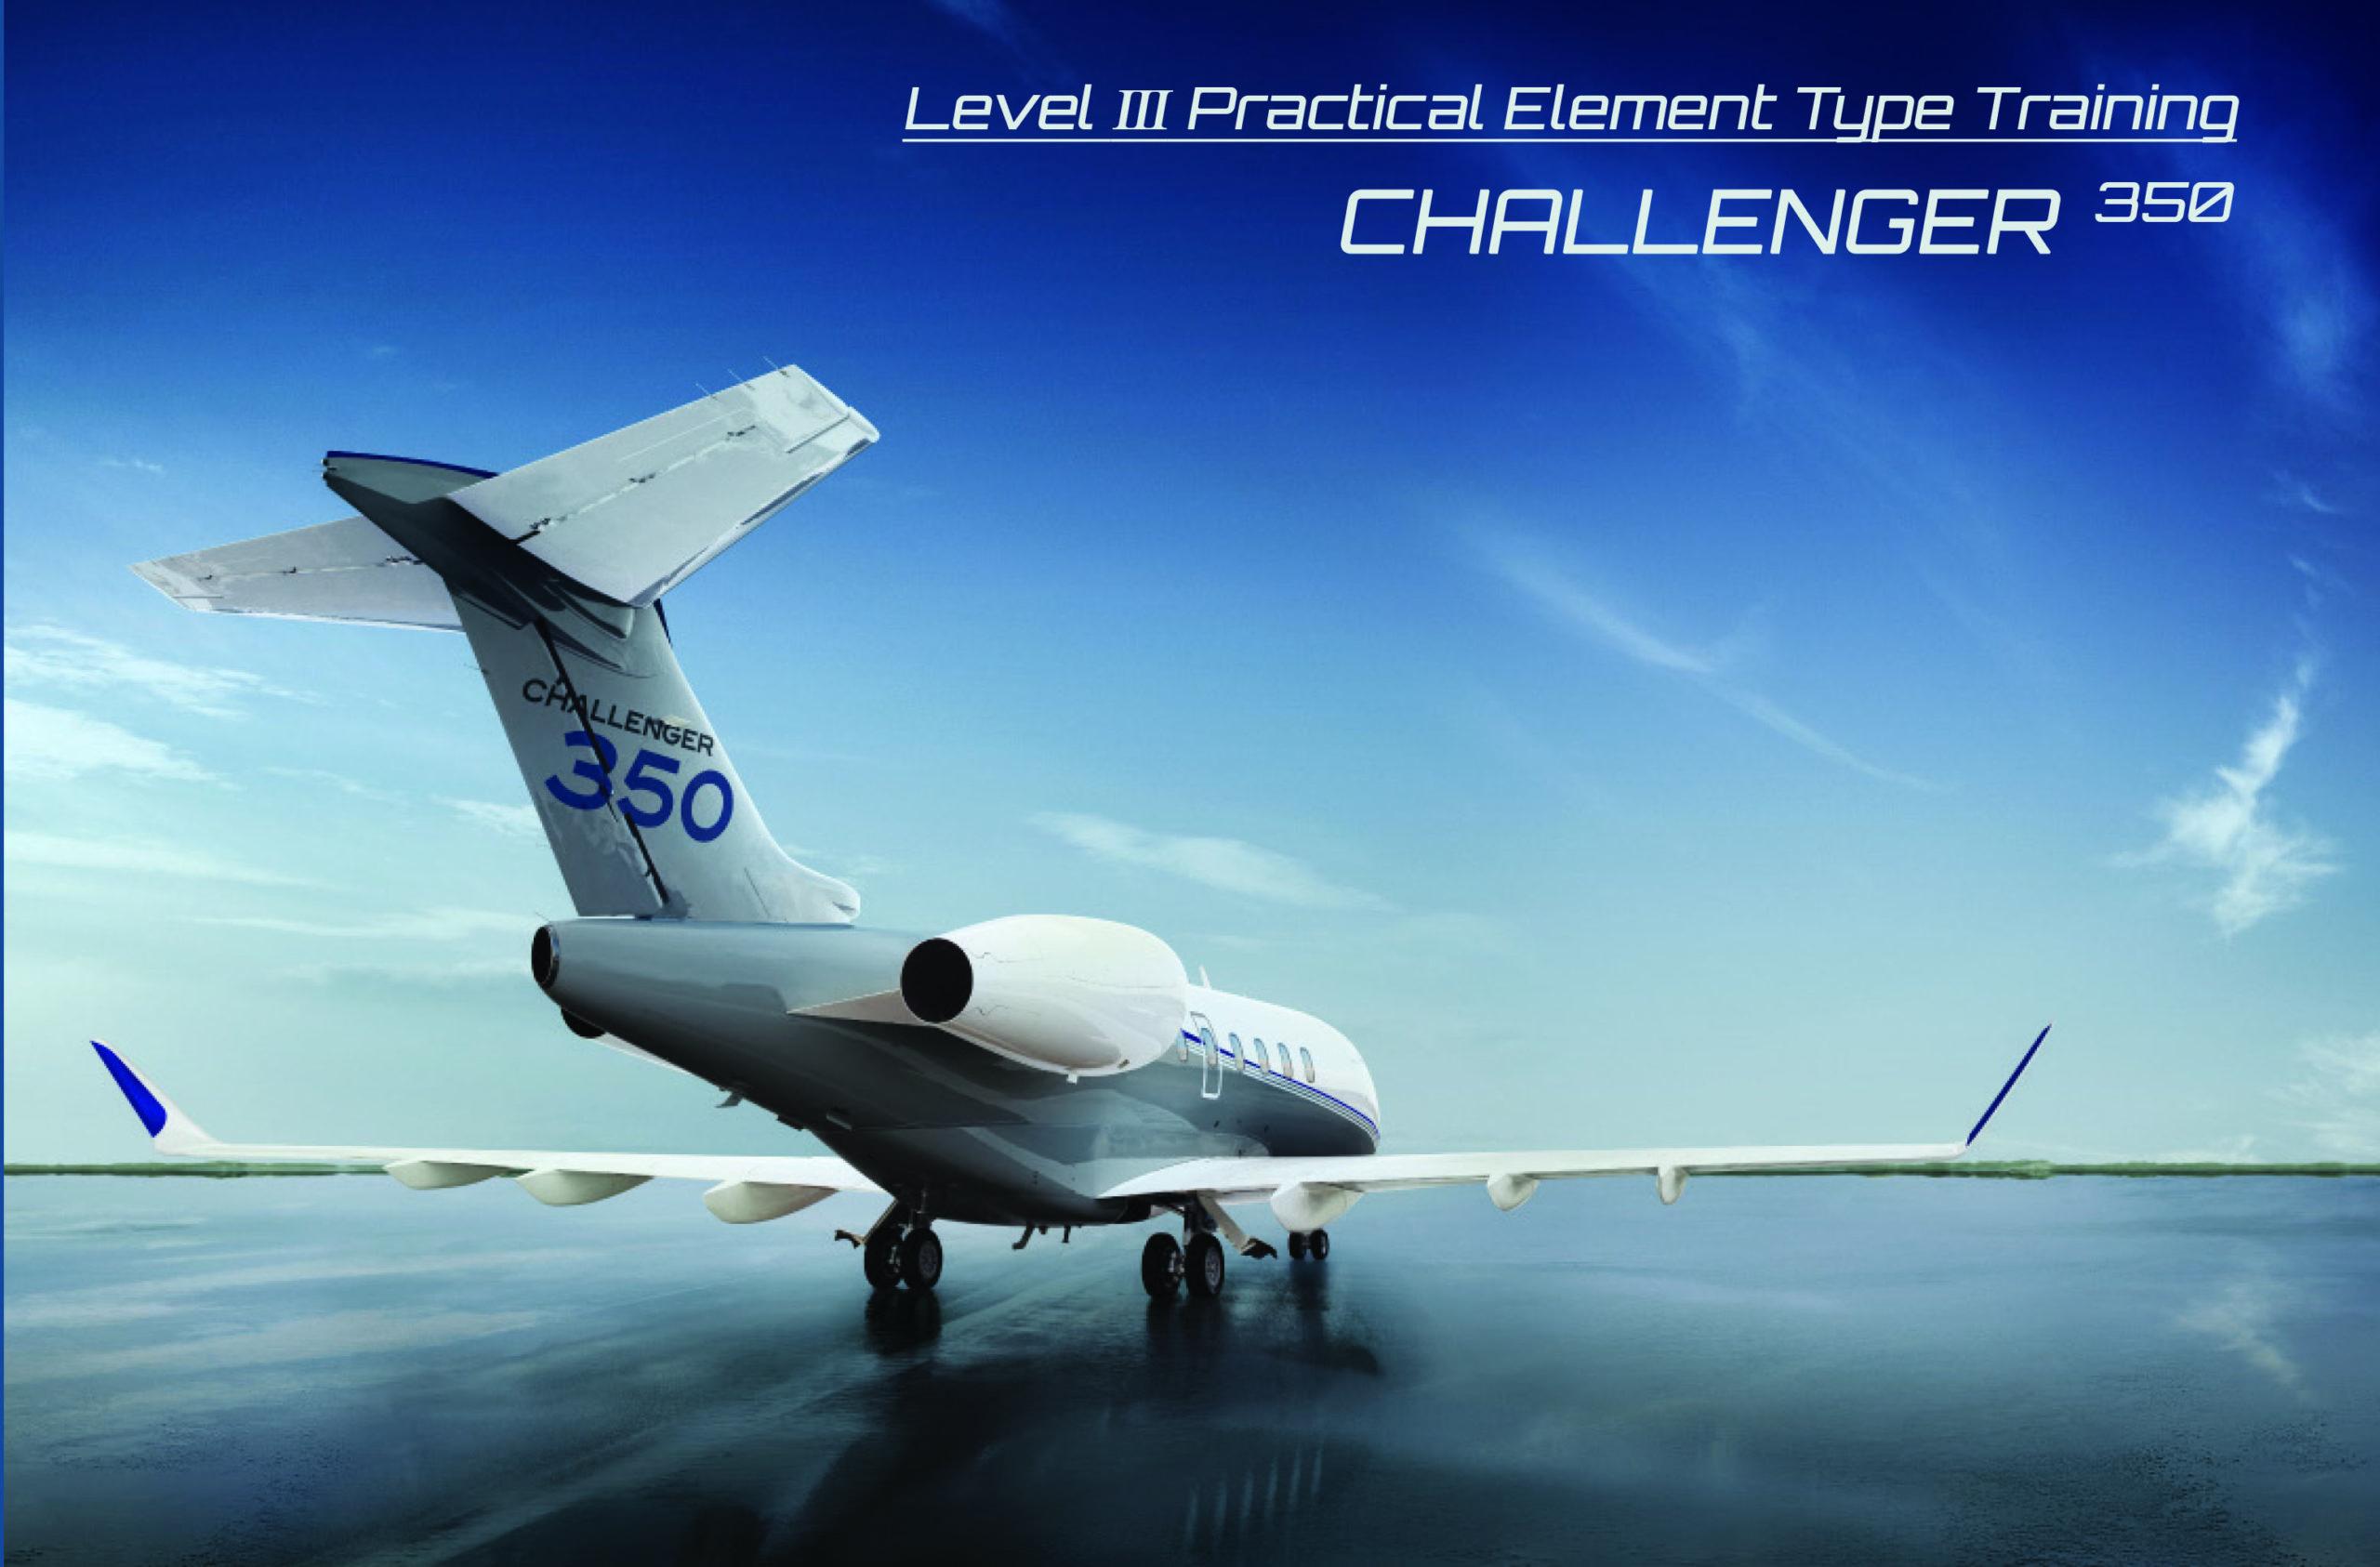 Bombardier Challenger 350 Level Ⅲ Practical Element Type Training